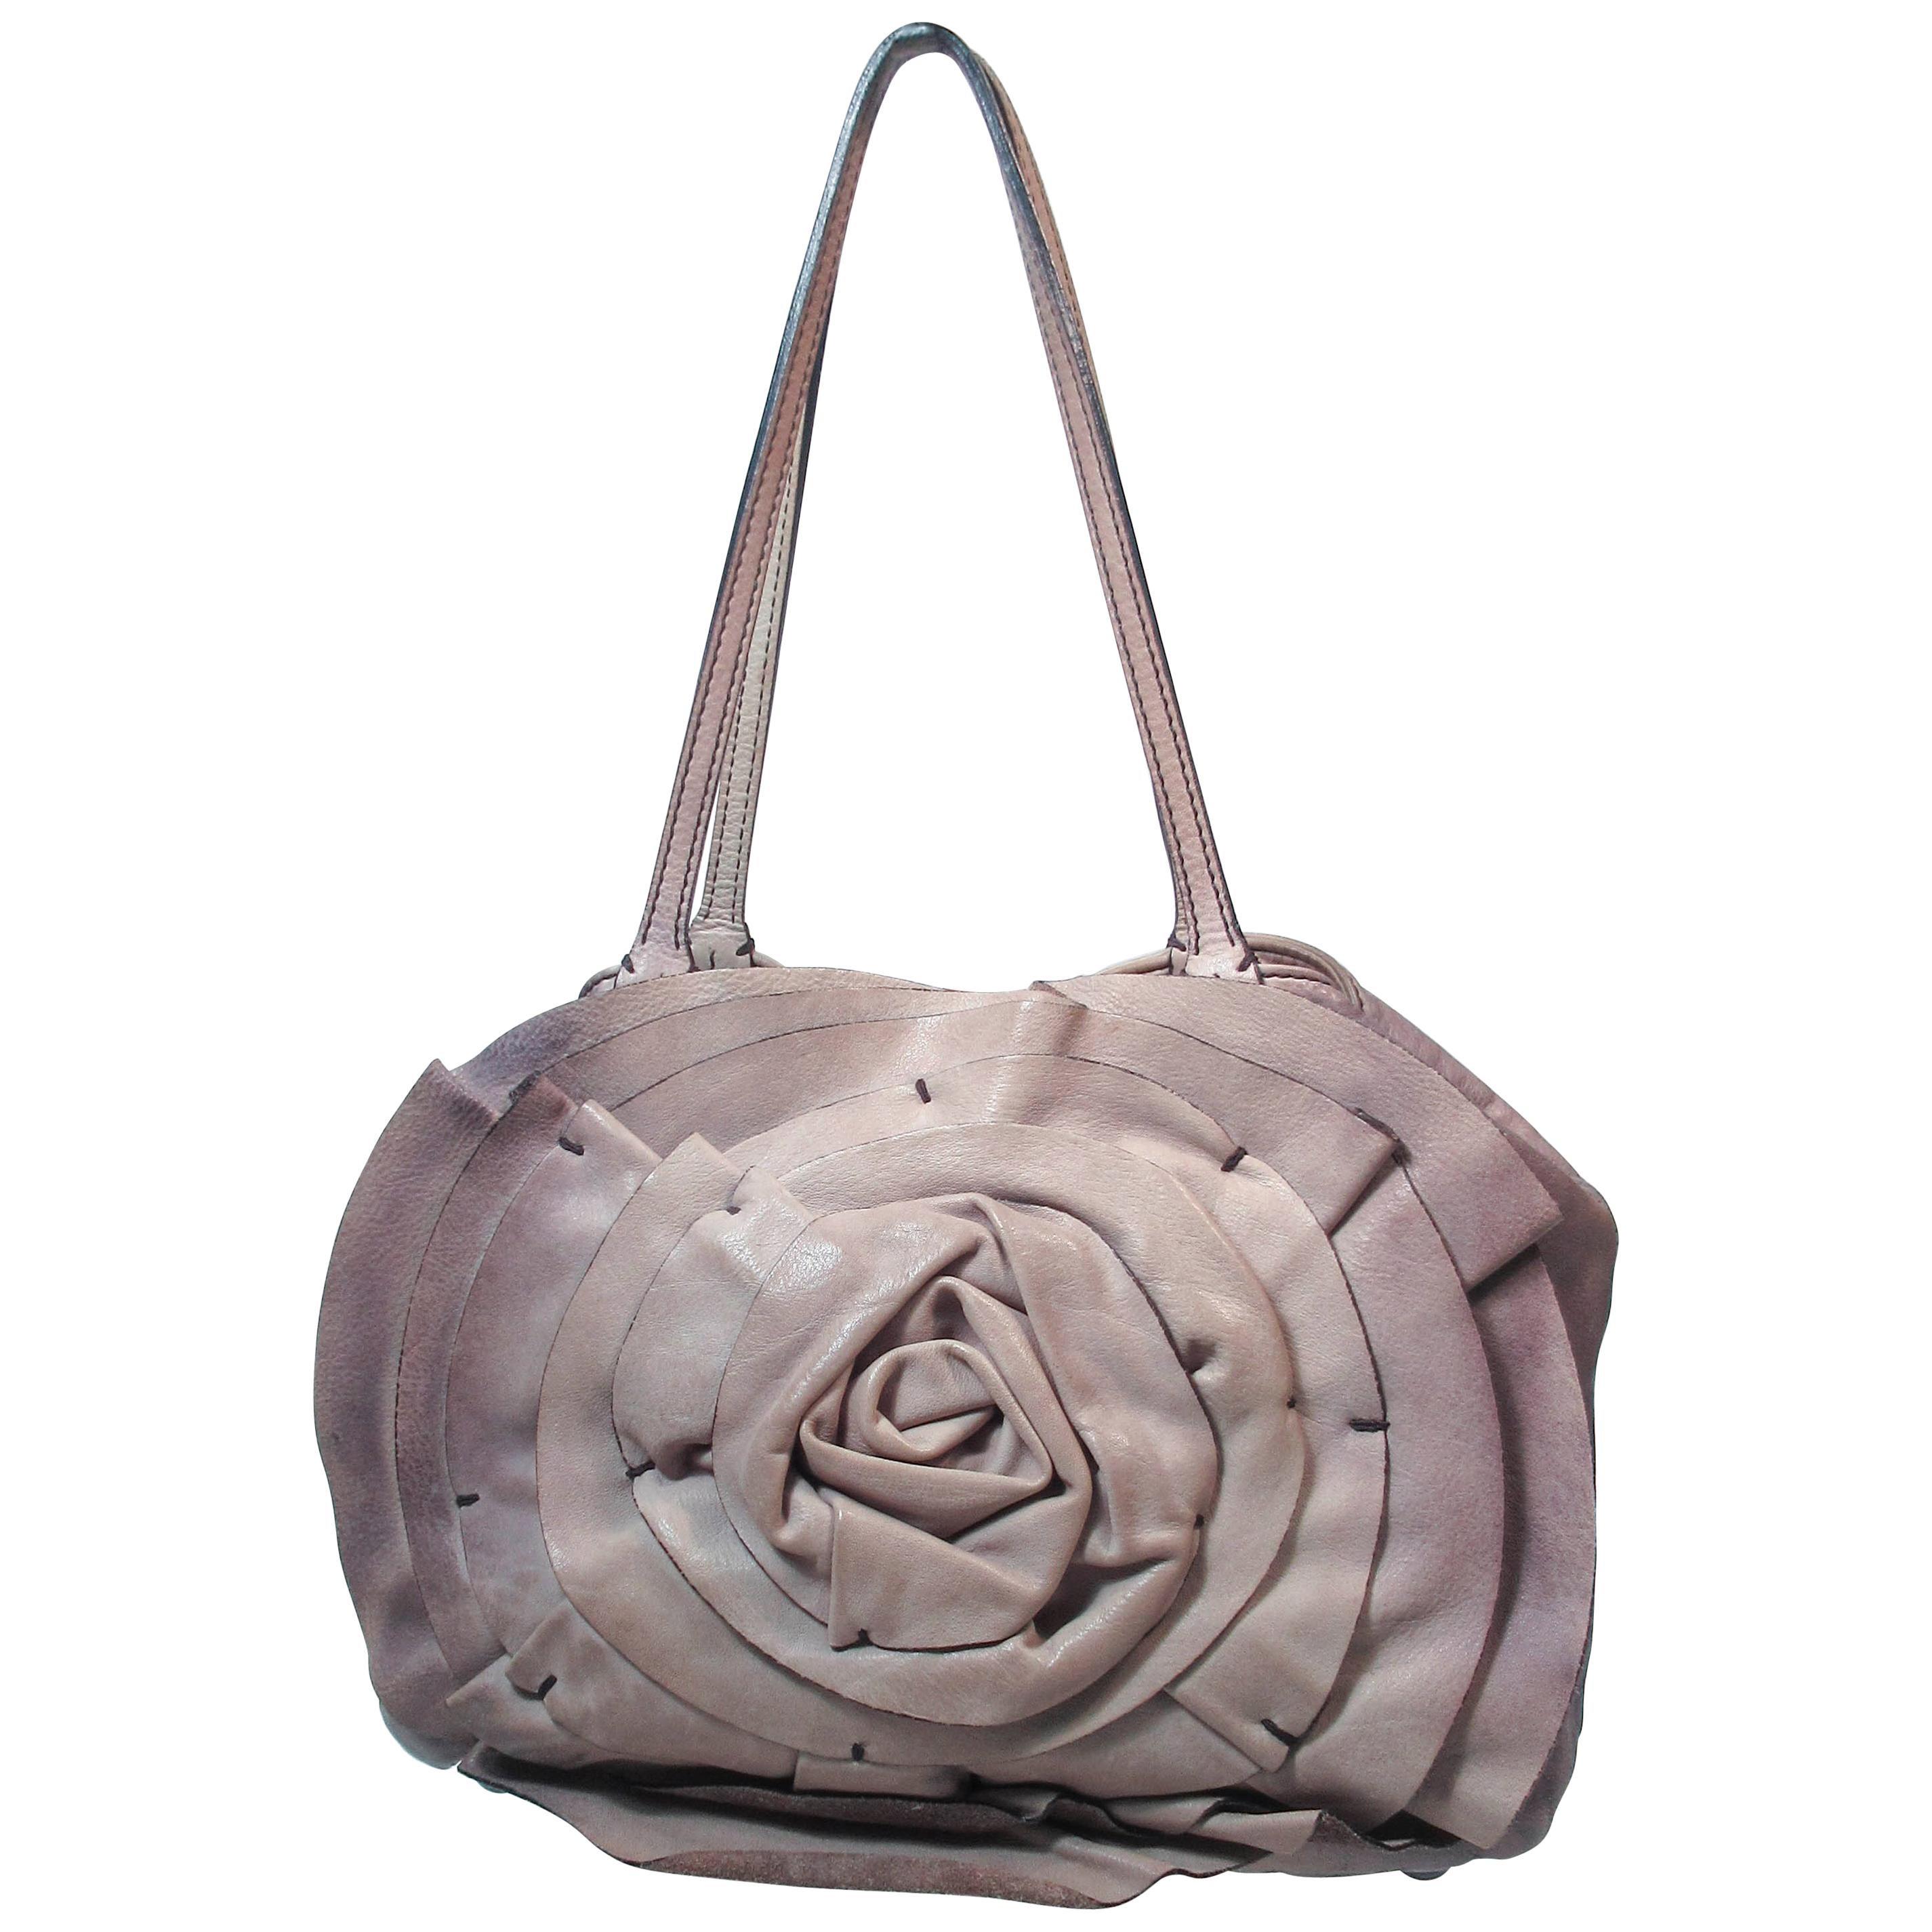 VALENTINO Distressed Rosebud Grey Leather Shopper Handbag